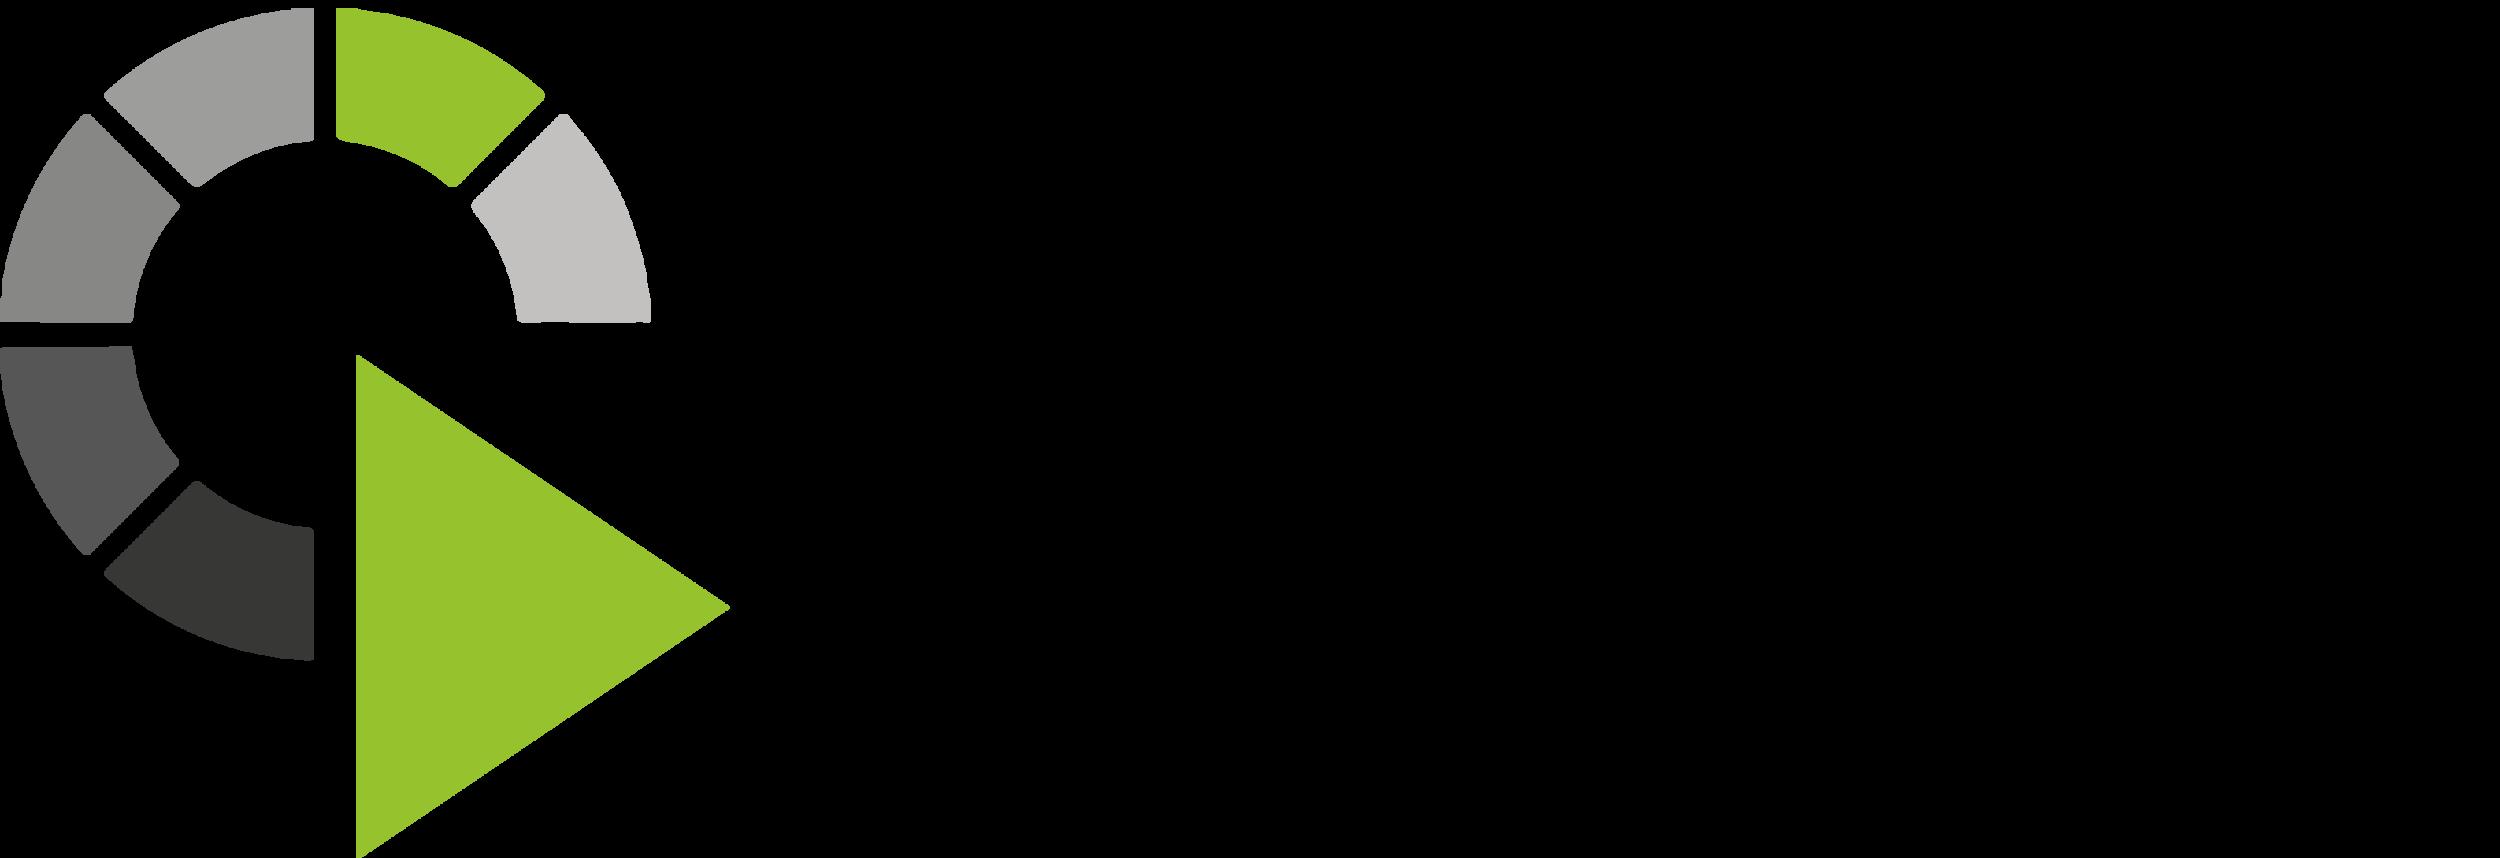 logo smart creative lab bra cuneo torino.png